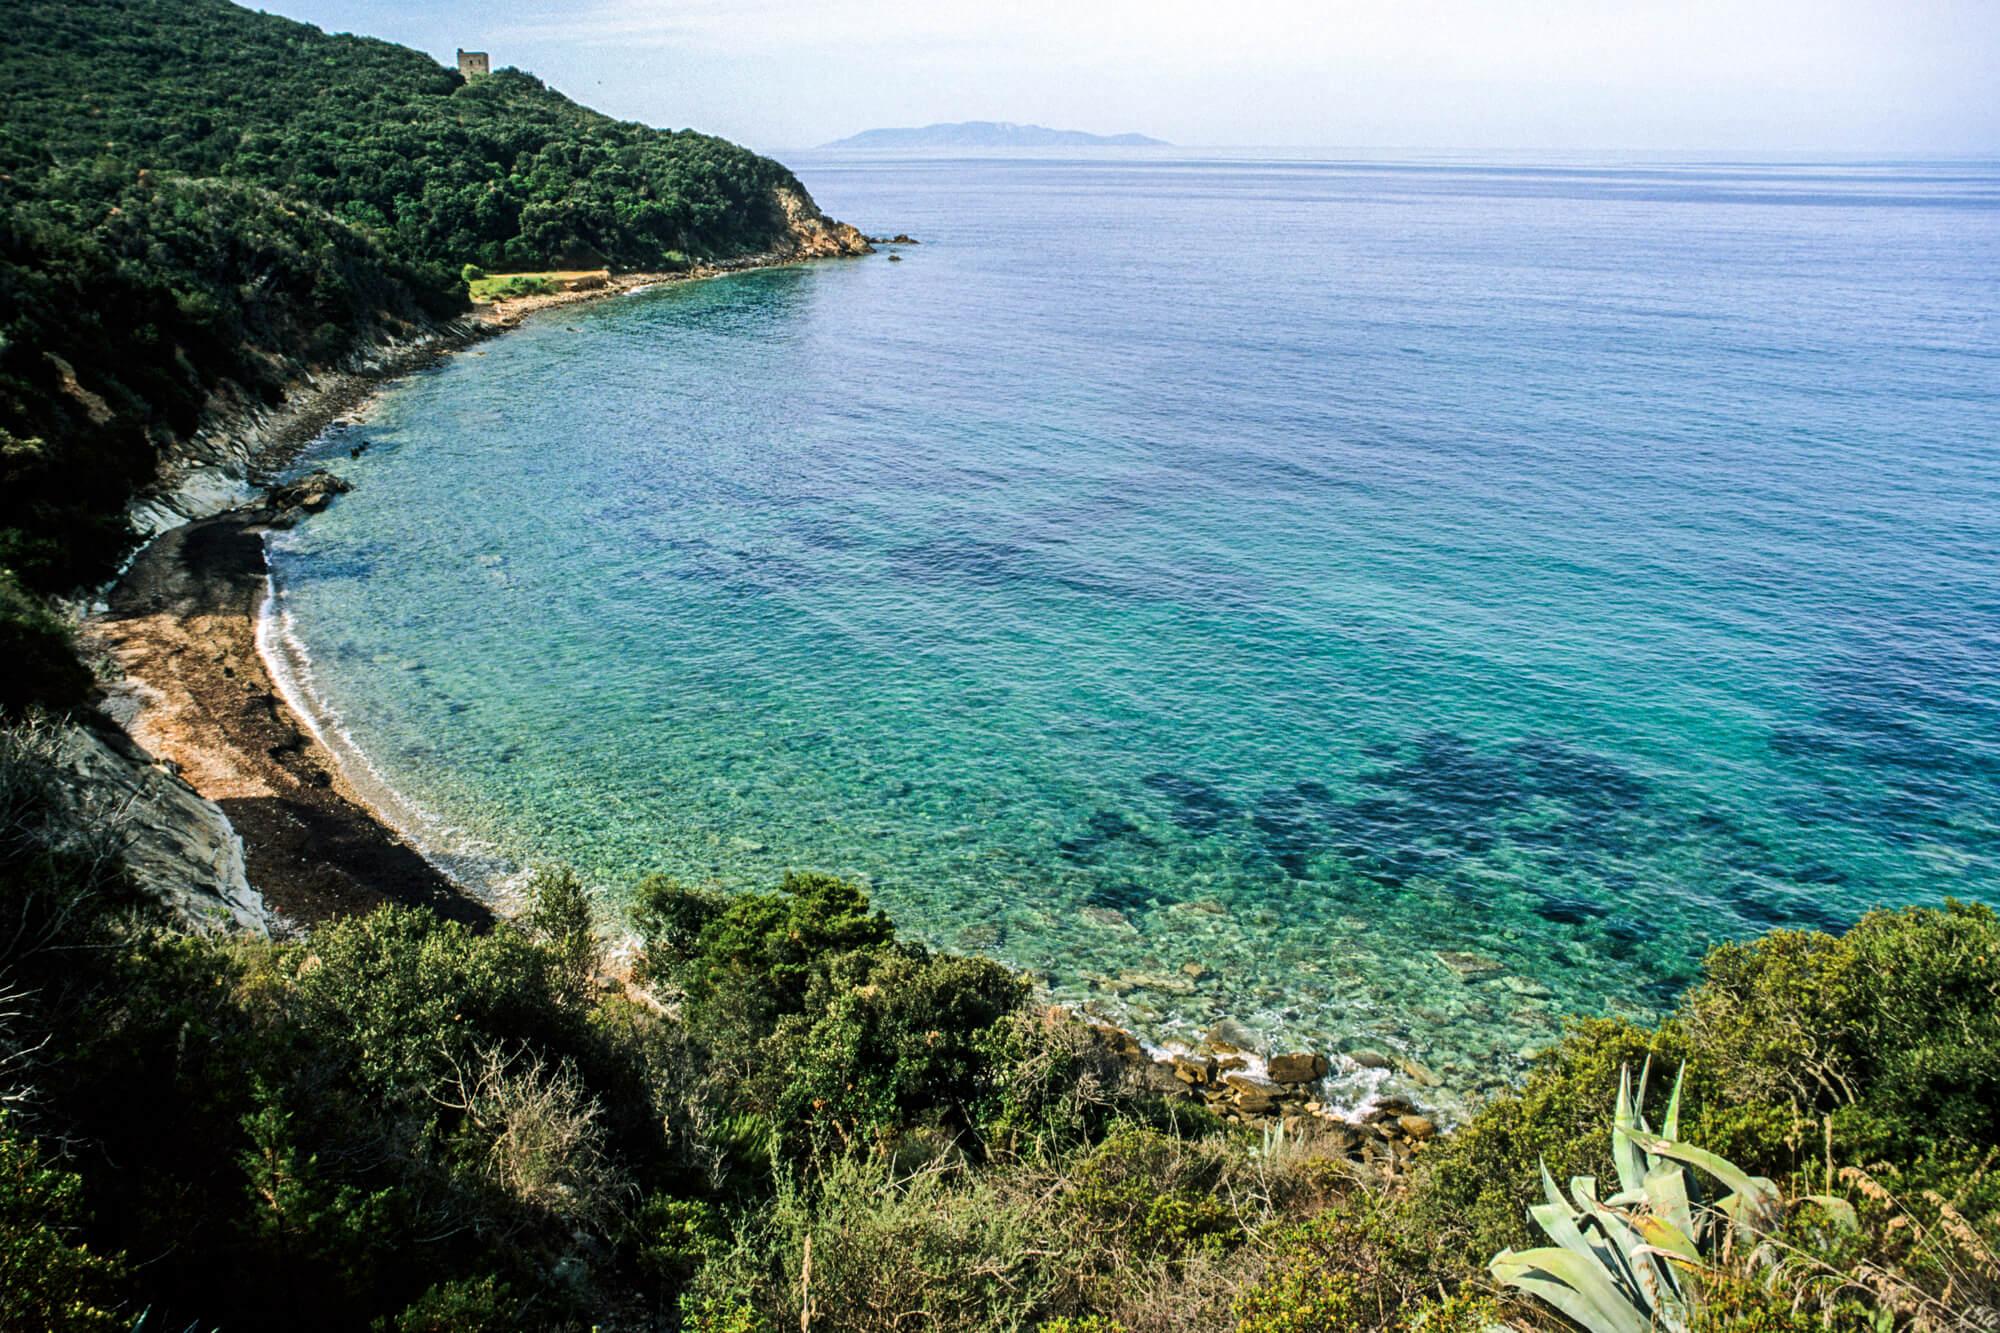 Talamone tuscan coastline